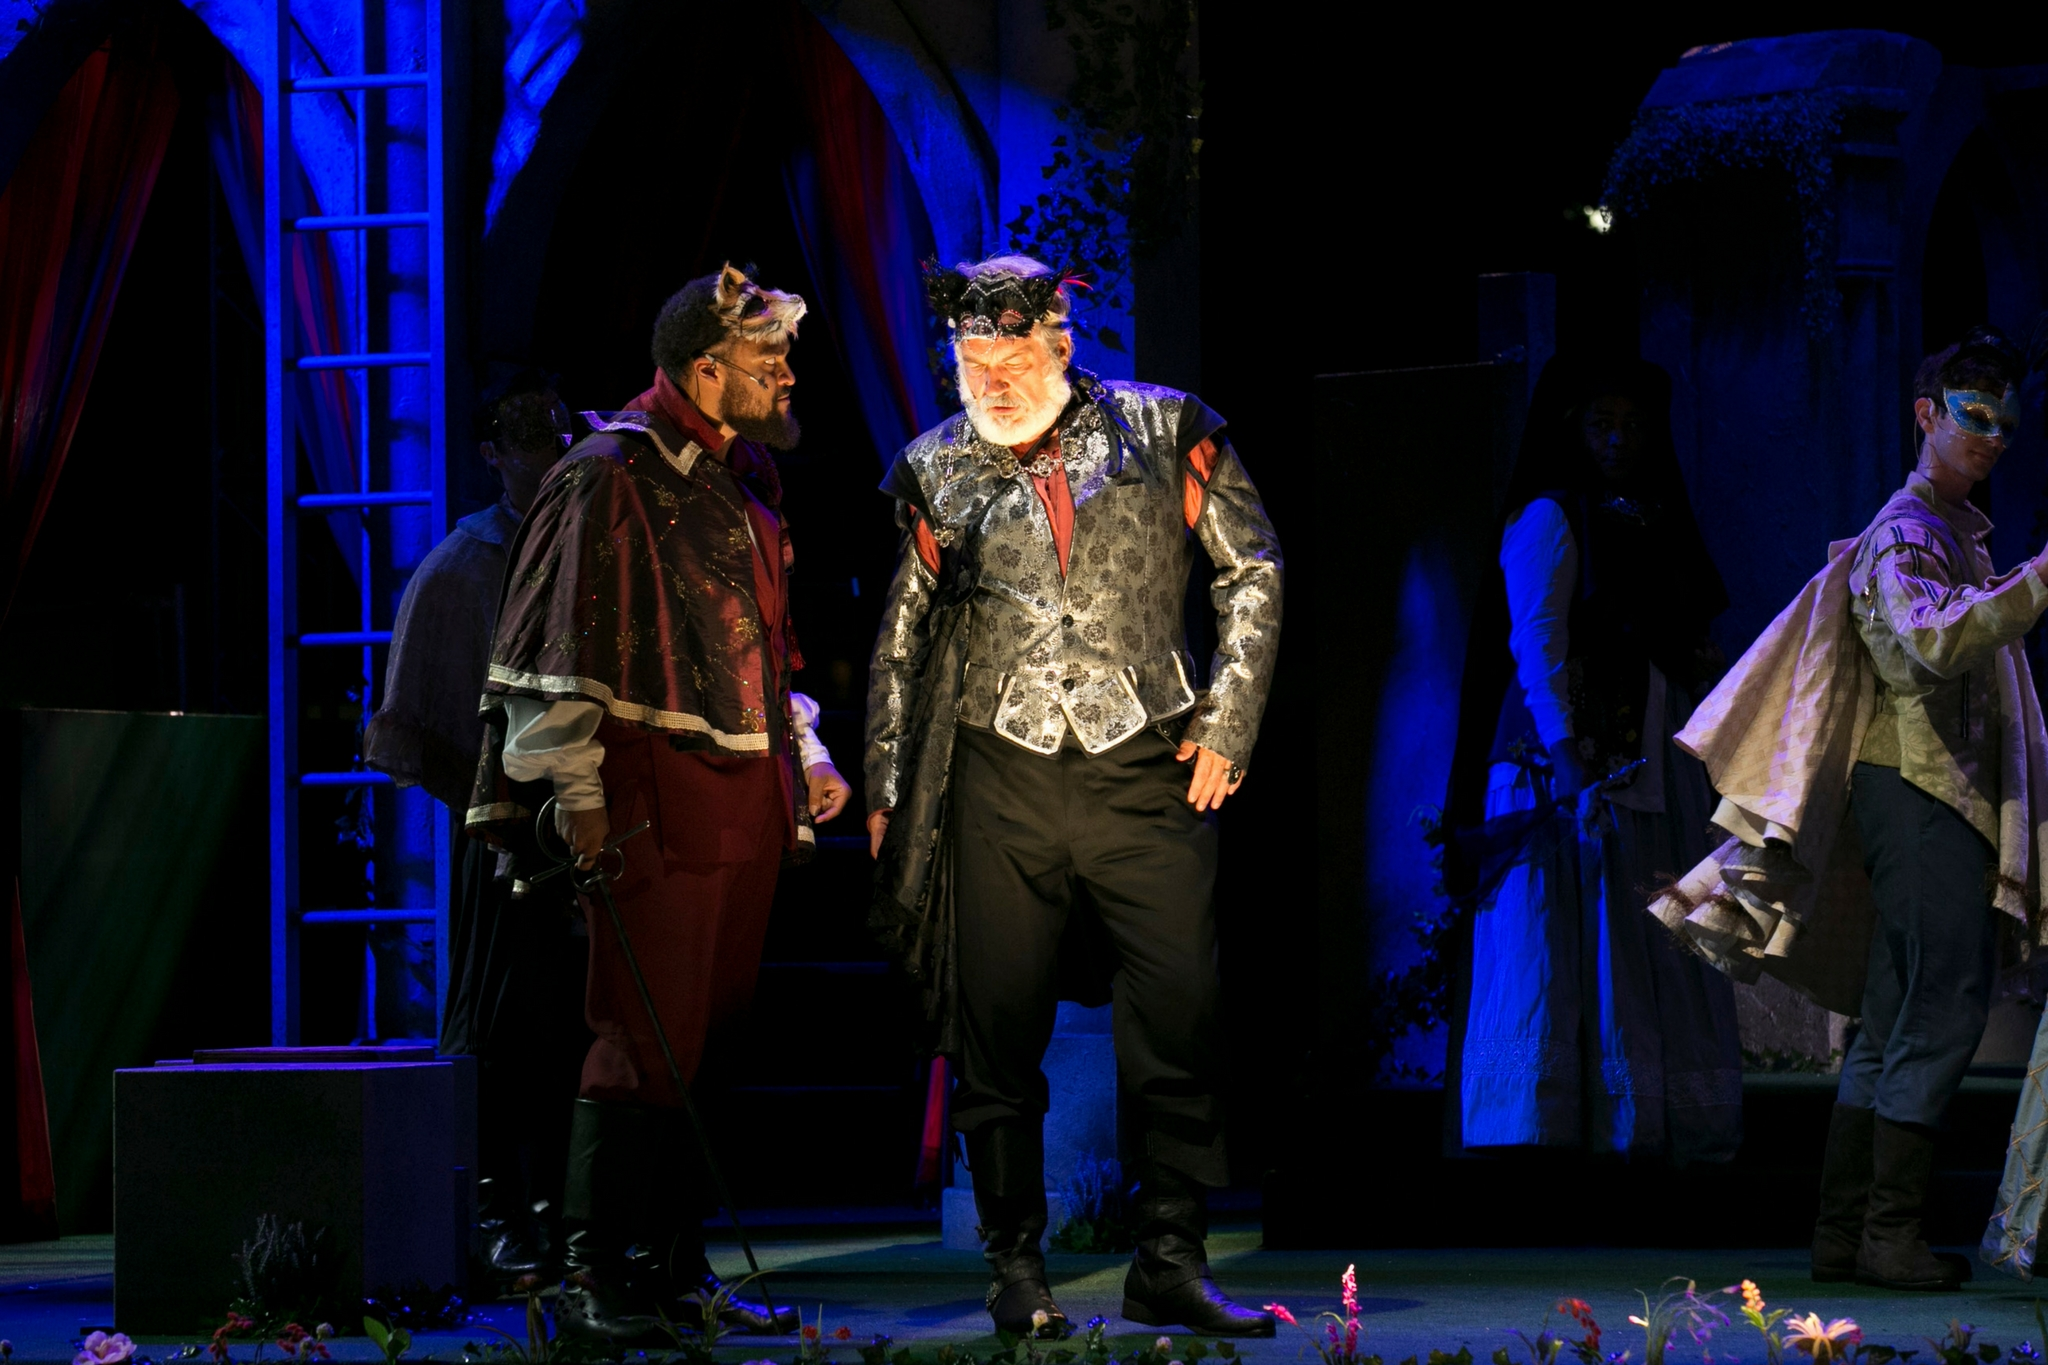 Kai Tshikosi (Tybalt) and Fred Sullivan, Jr. (Lord Capulet) in Romeo & Juliet, Shakespeare on the Common 2017-Photo by Evgenia Eliseeva